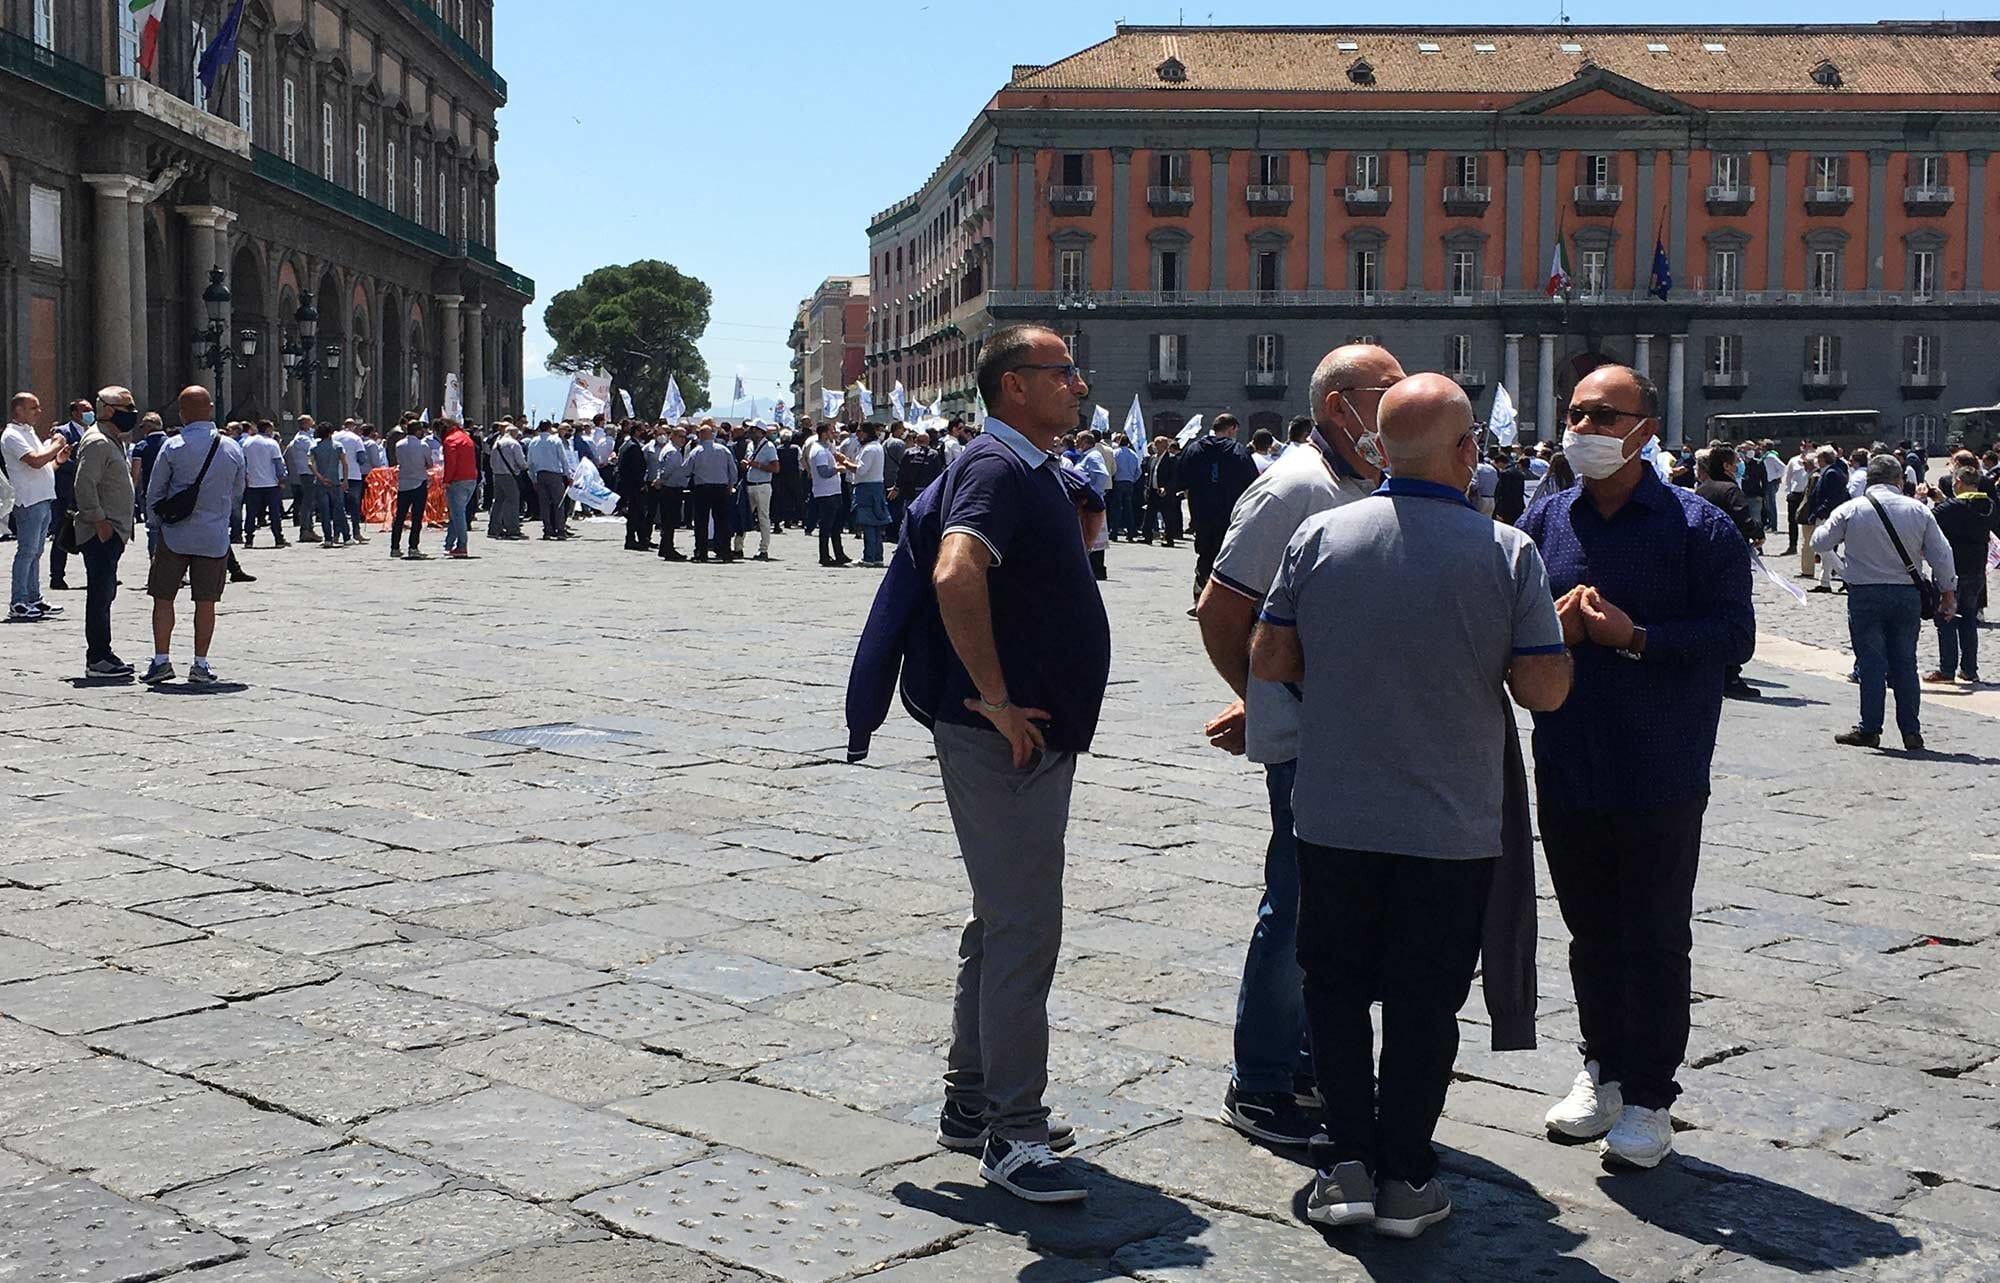 piazza-plebeschito-riot-or-somthn.jpg